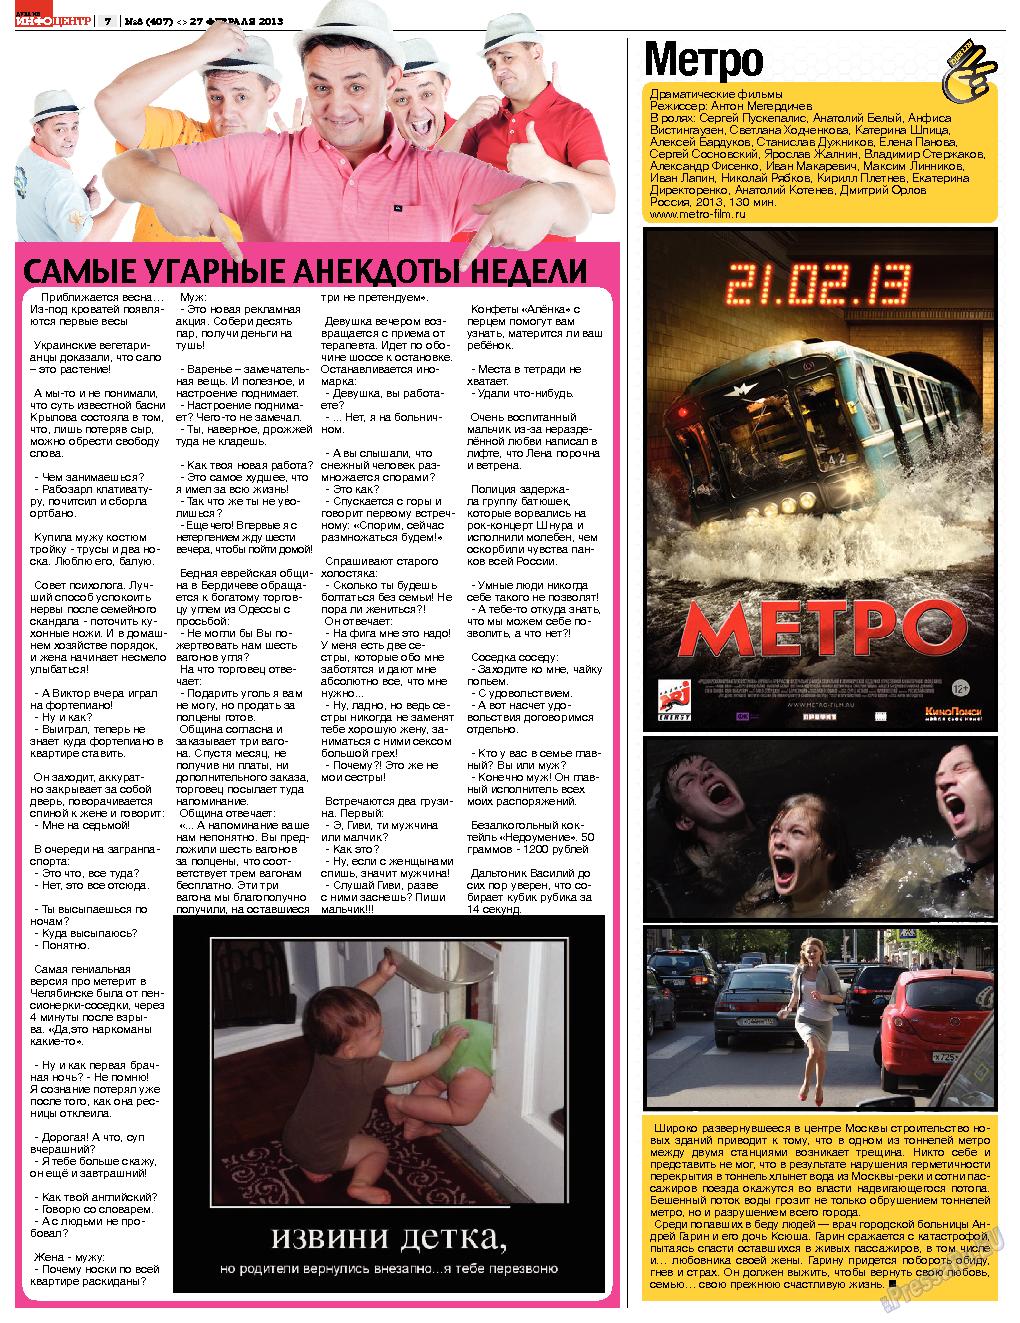 Дублин инфоцентр (газета). 2013 год, номер 8, стр. 7